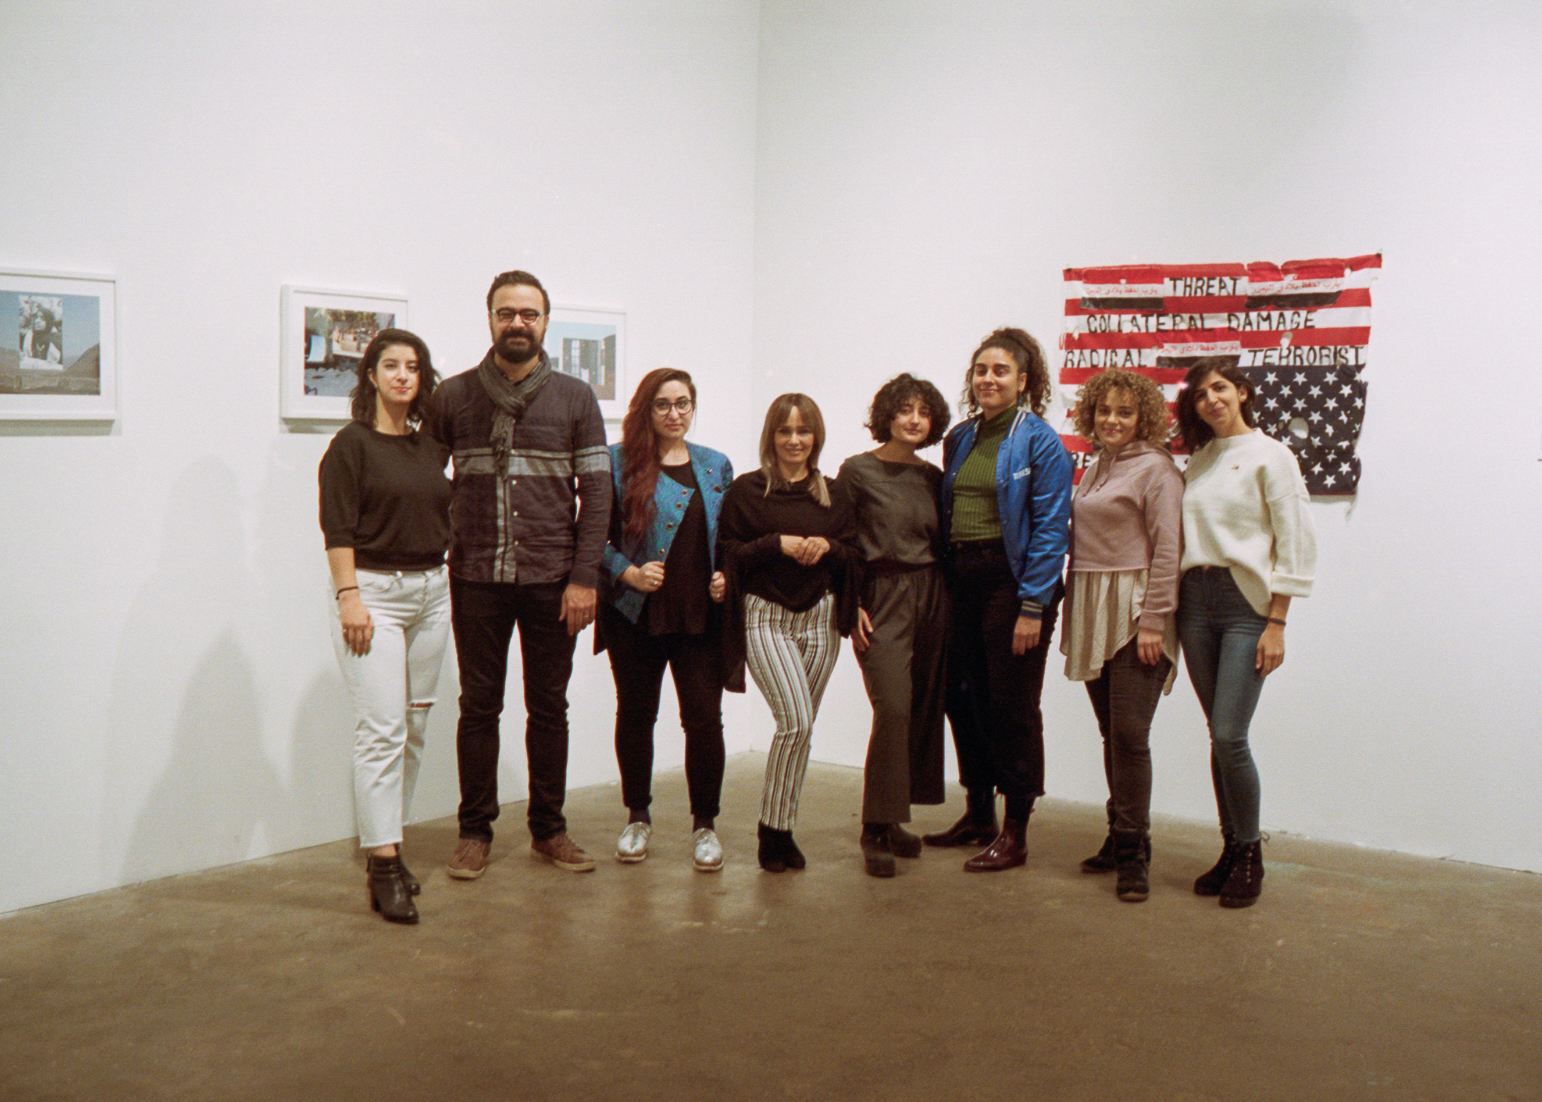 From left to right:Kiana Pirouz, Farhad B  arham  , Soraya Majd, Asiya Al-Sharabi, Tandis Shoushtary, Carmen Daneshmandi, Gina Malek, and Mahya Soltani. Photo by Jack Newton.